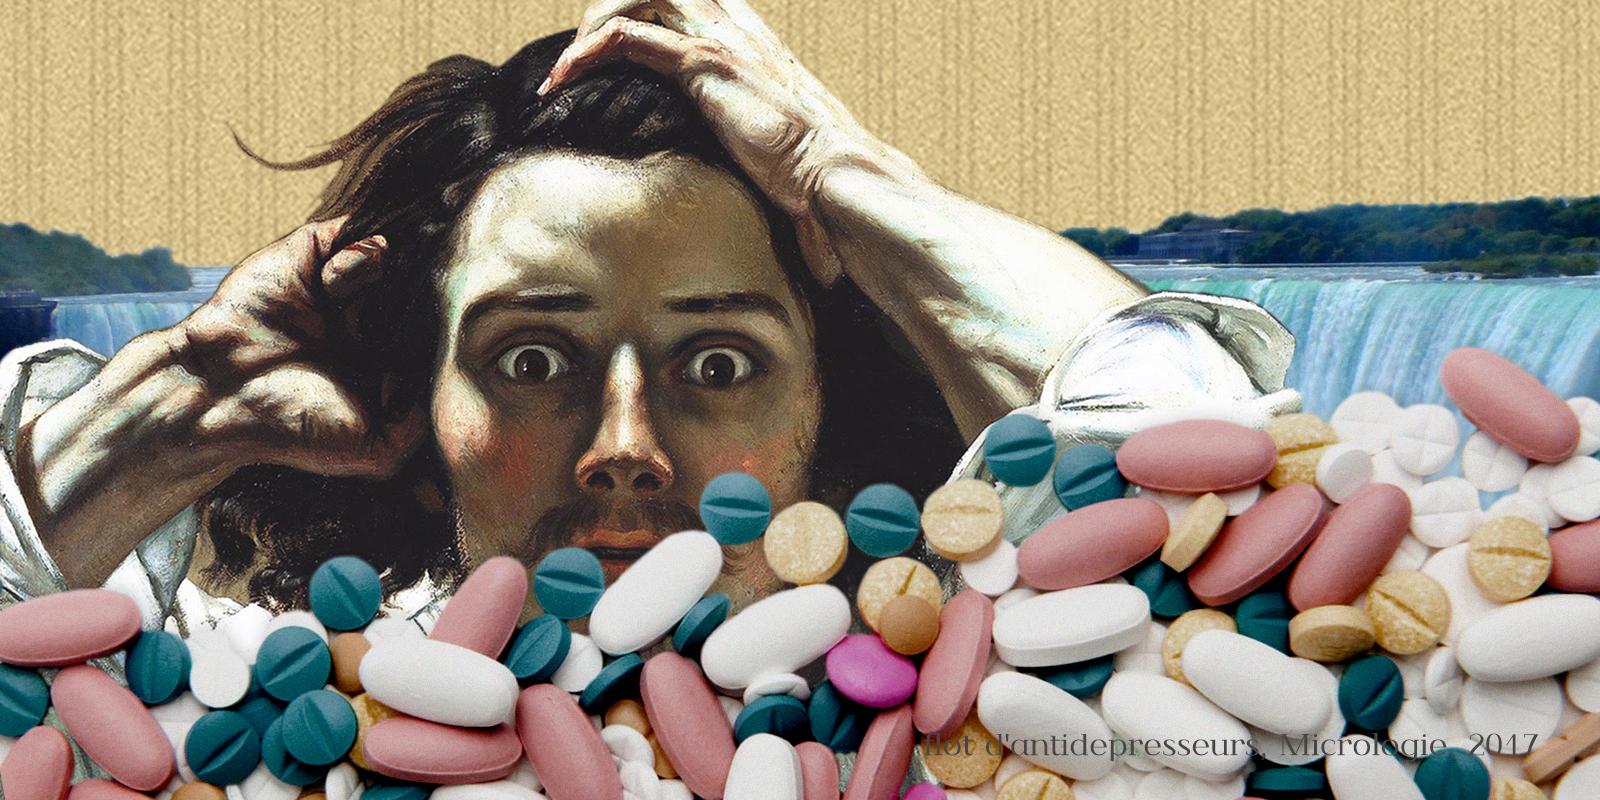 Flot d'antidépresseurs, micrologie